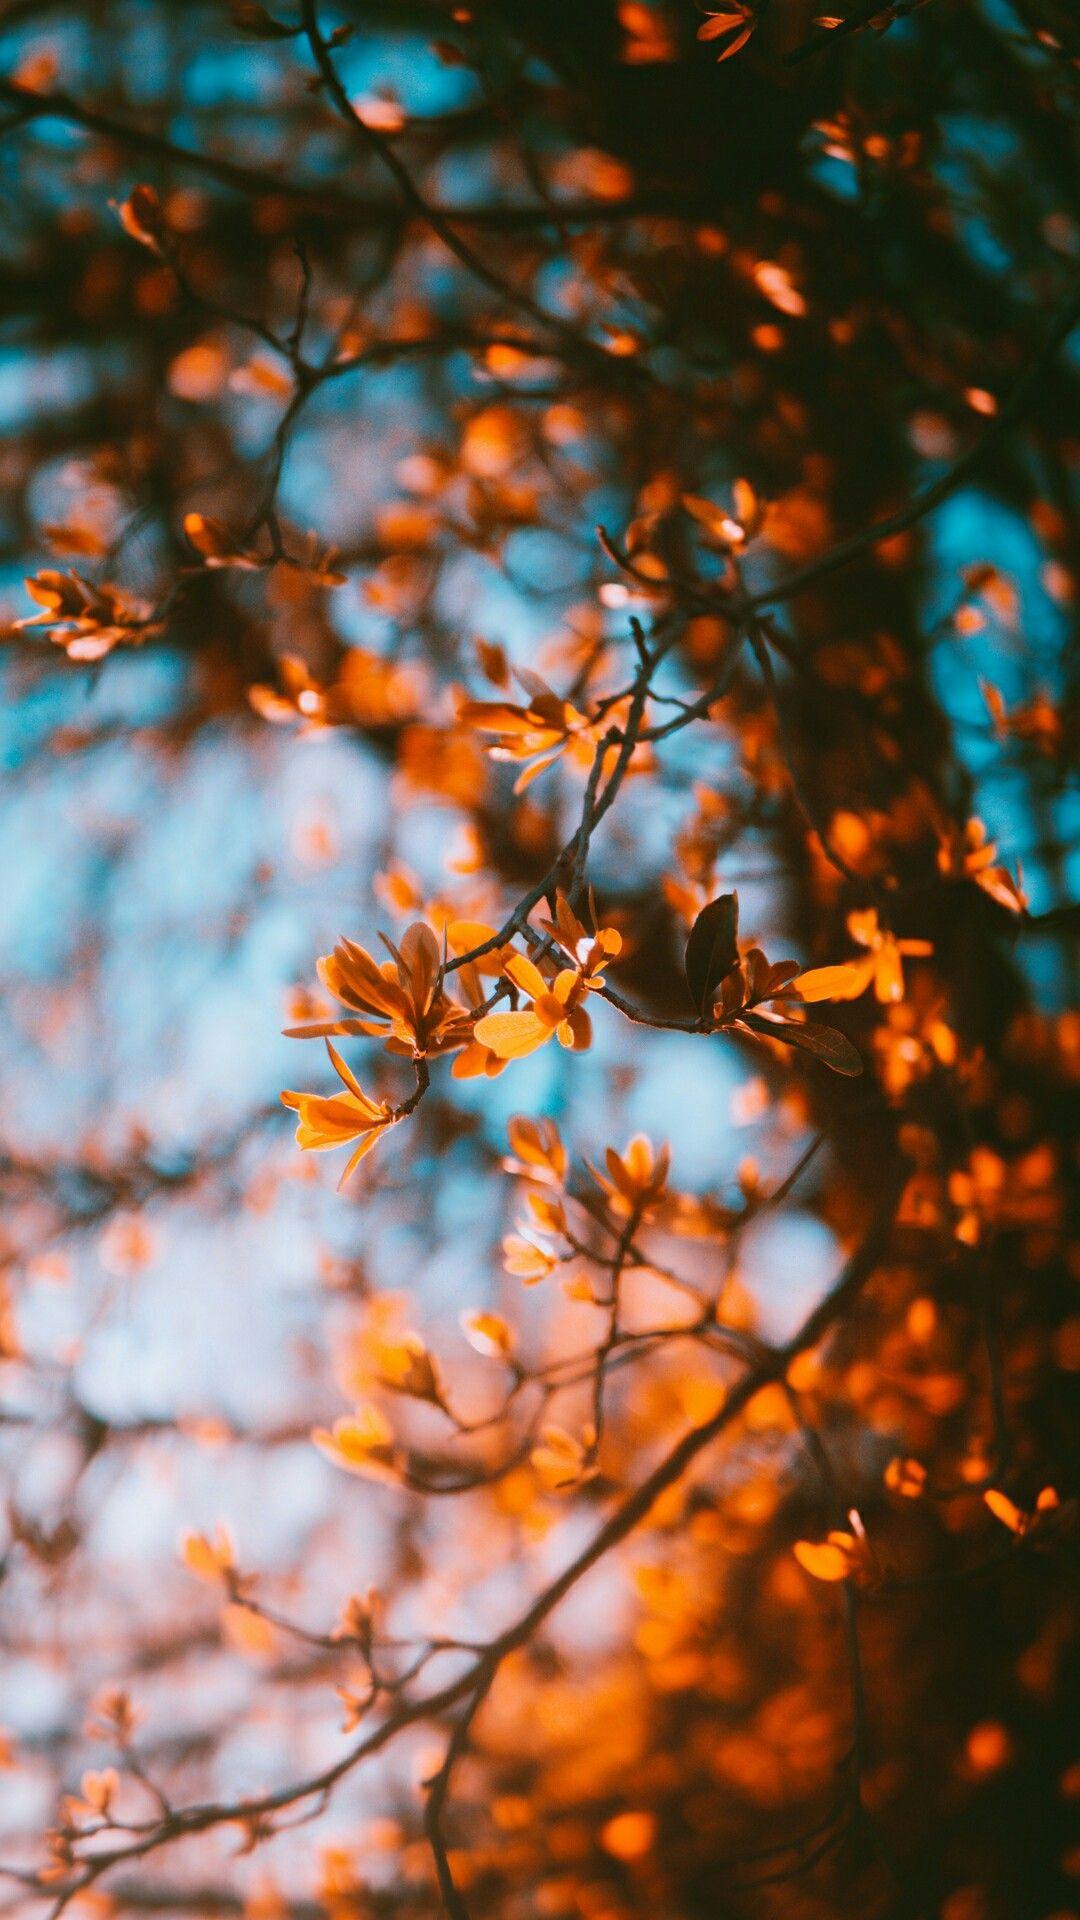 These Colors Outside Littlewonders Autumn Fotografie Achtergronden Achtergronden Wallpaper Achtergronden